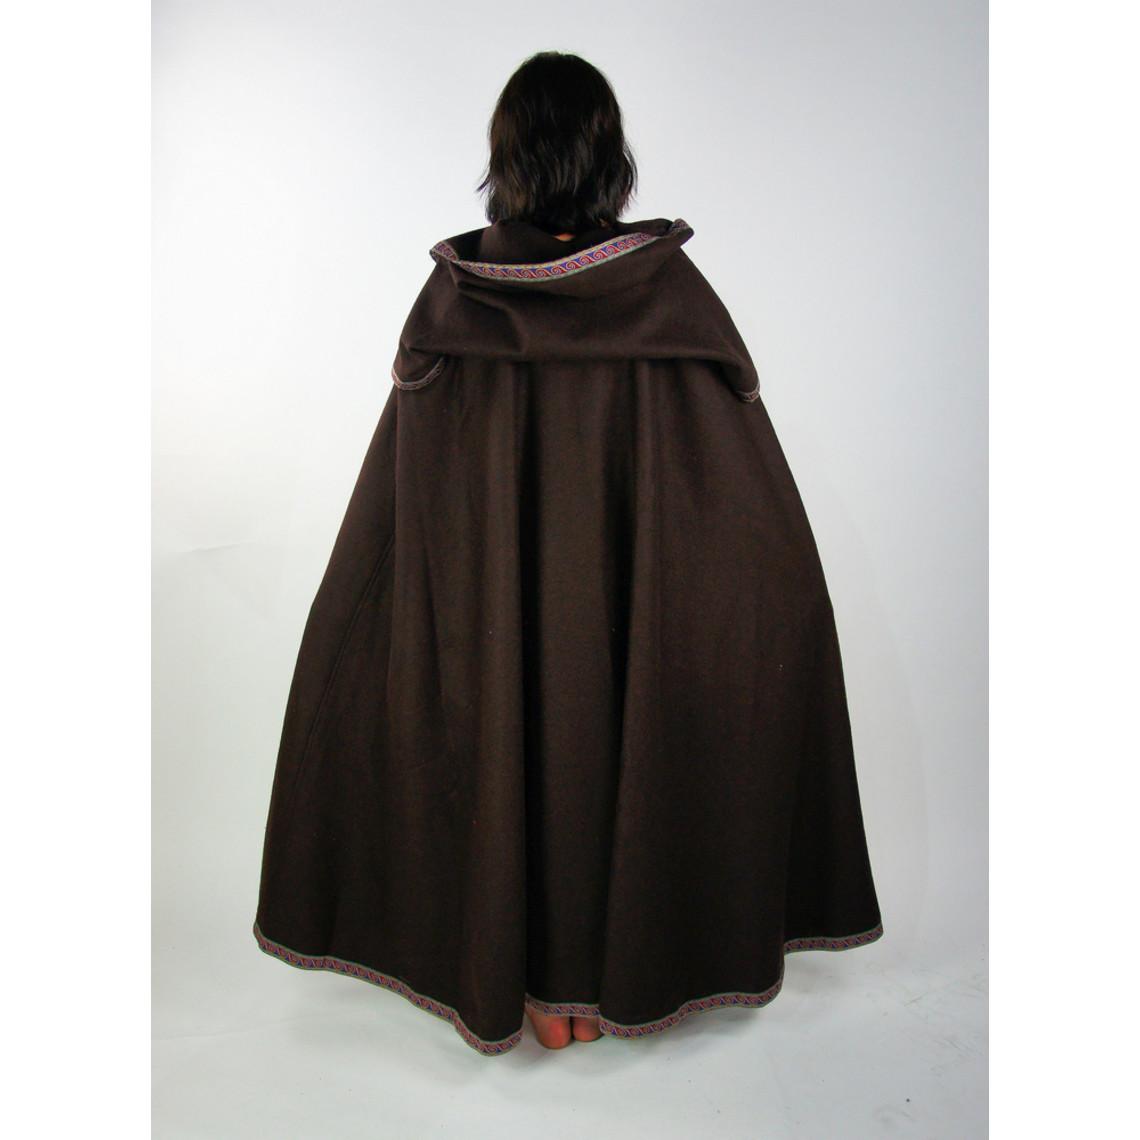 Leonardo Carbone Geborduurde mantel Lyra, bruin